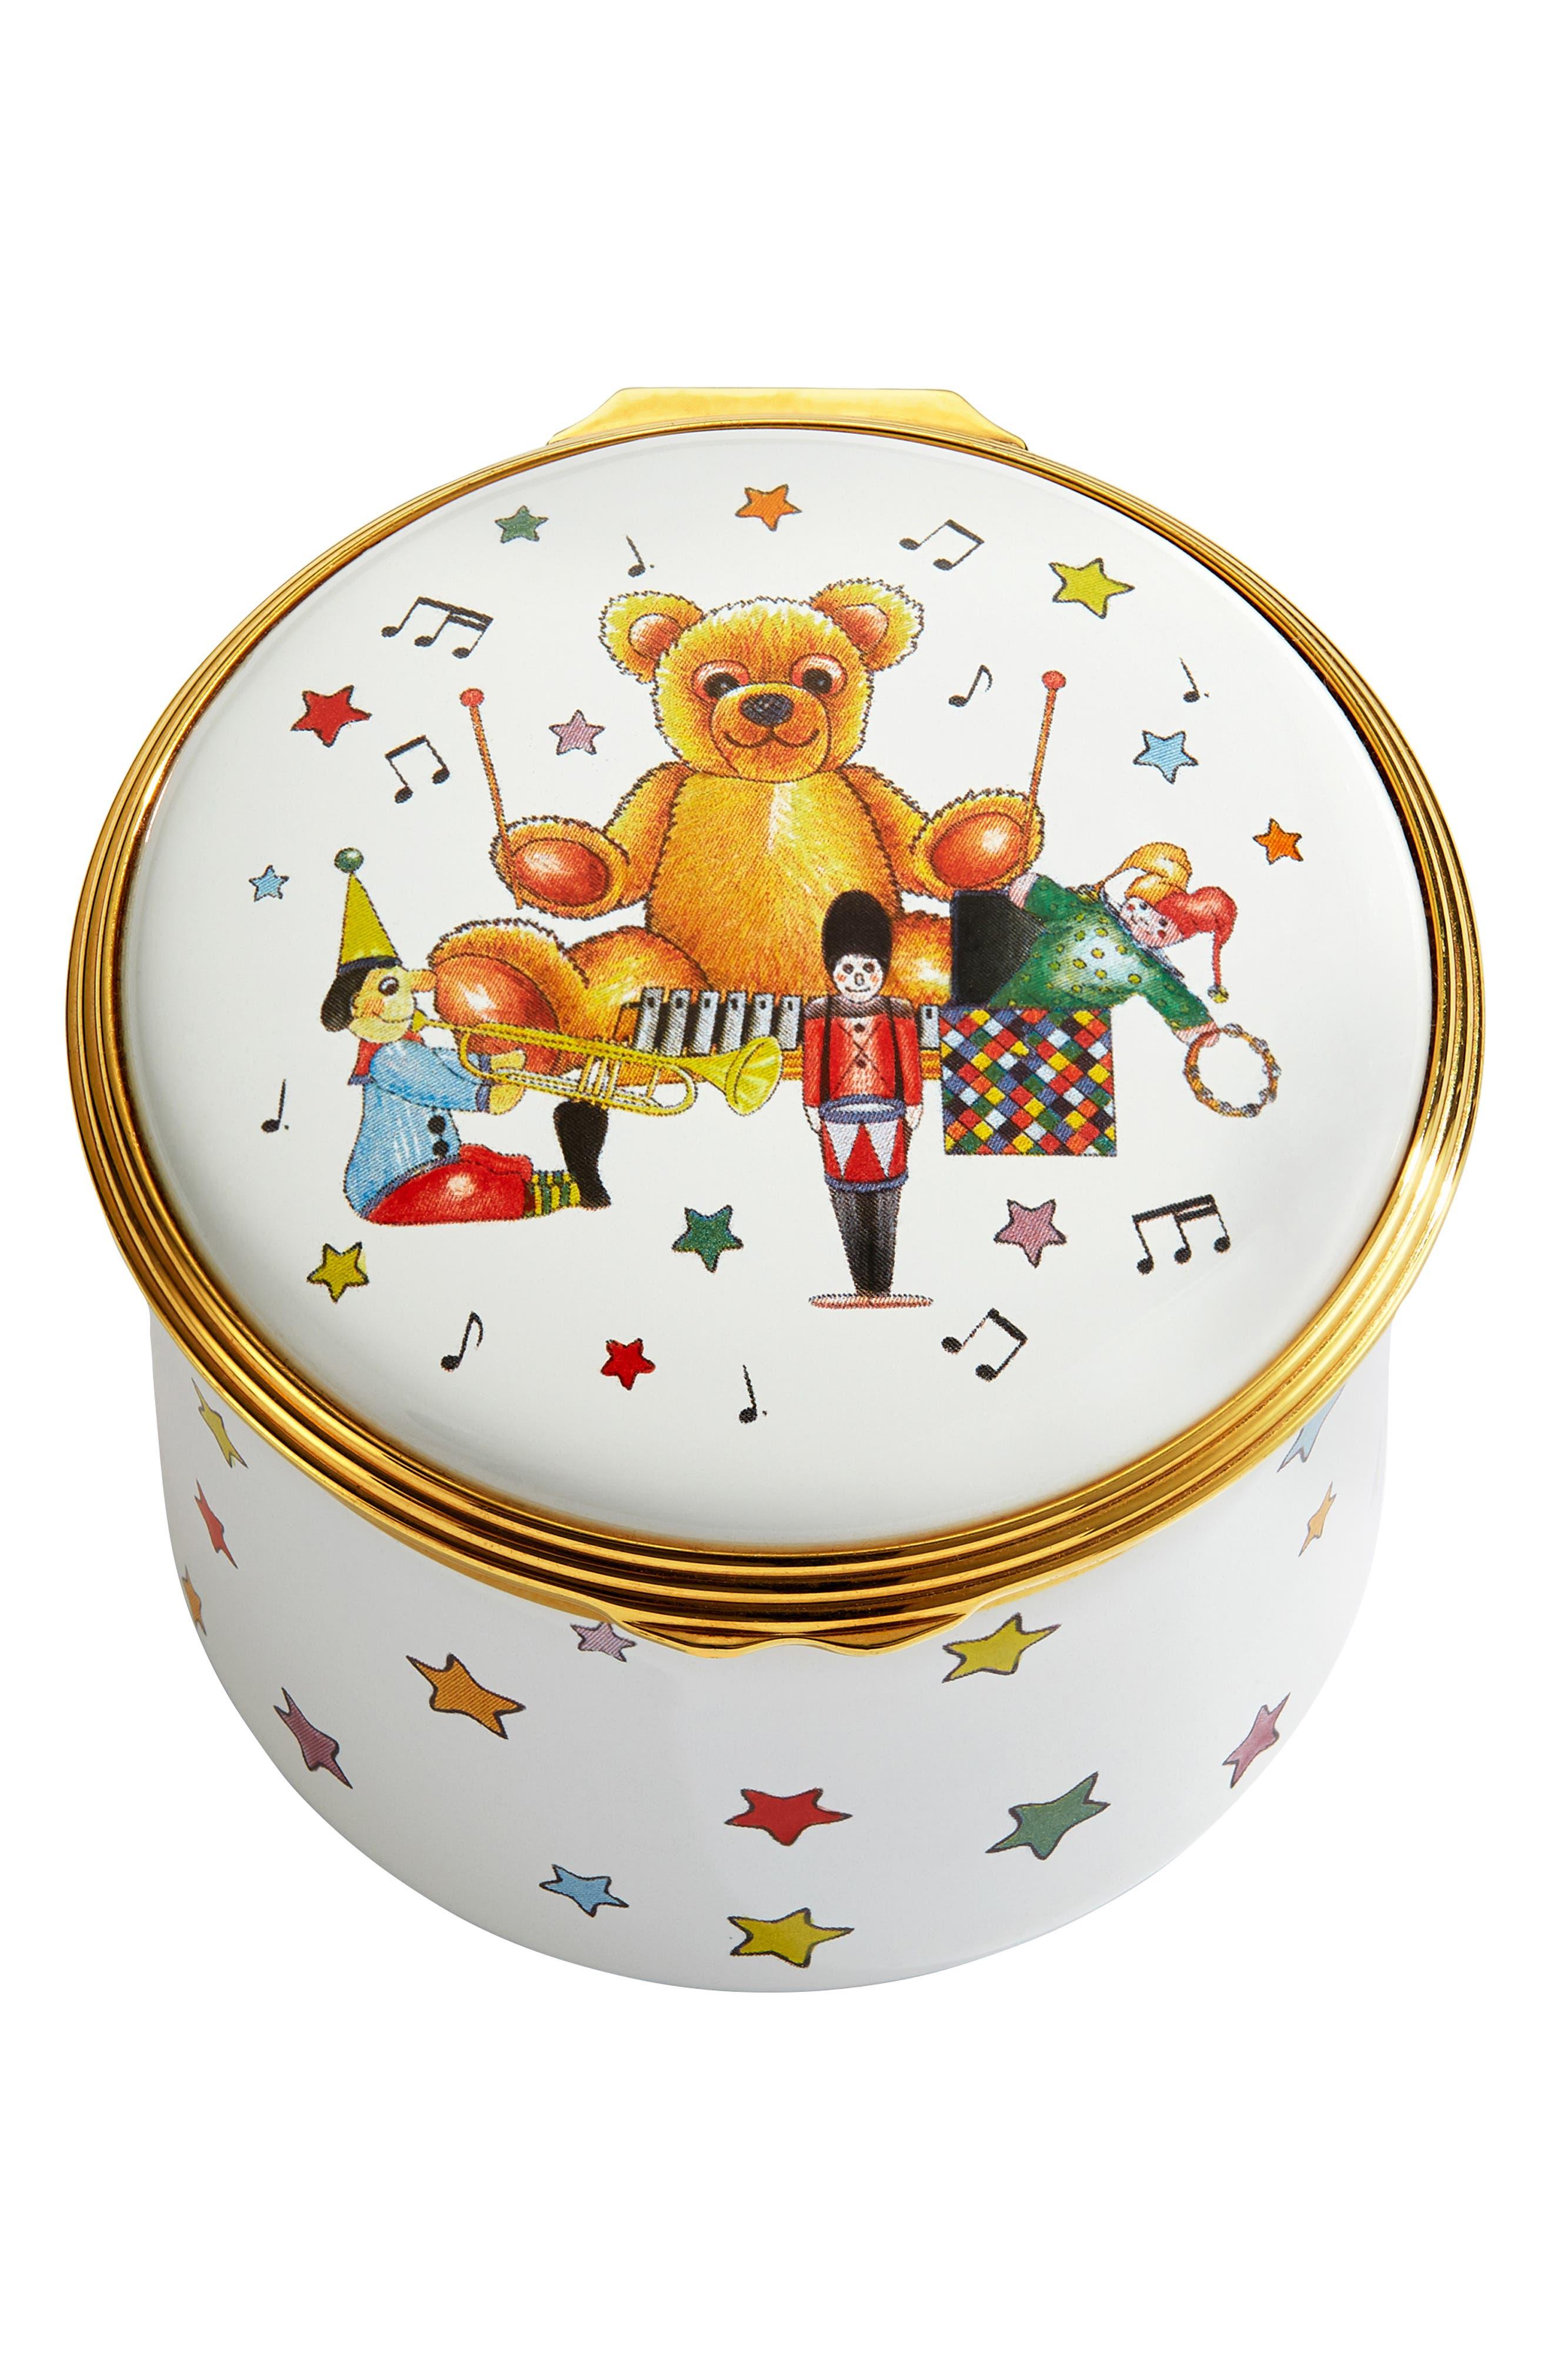 Halcyon Days Twinkle Twinkle Little Star Enamel Music Box Size One Size  White